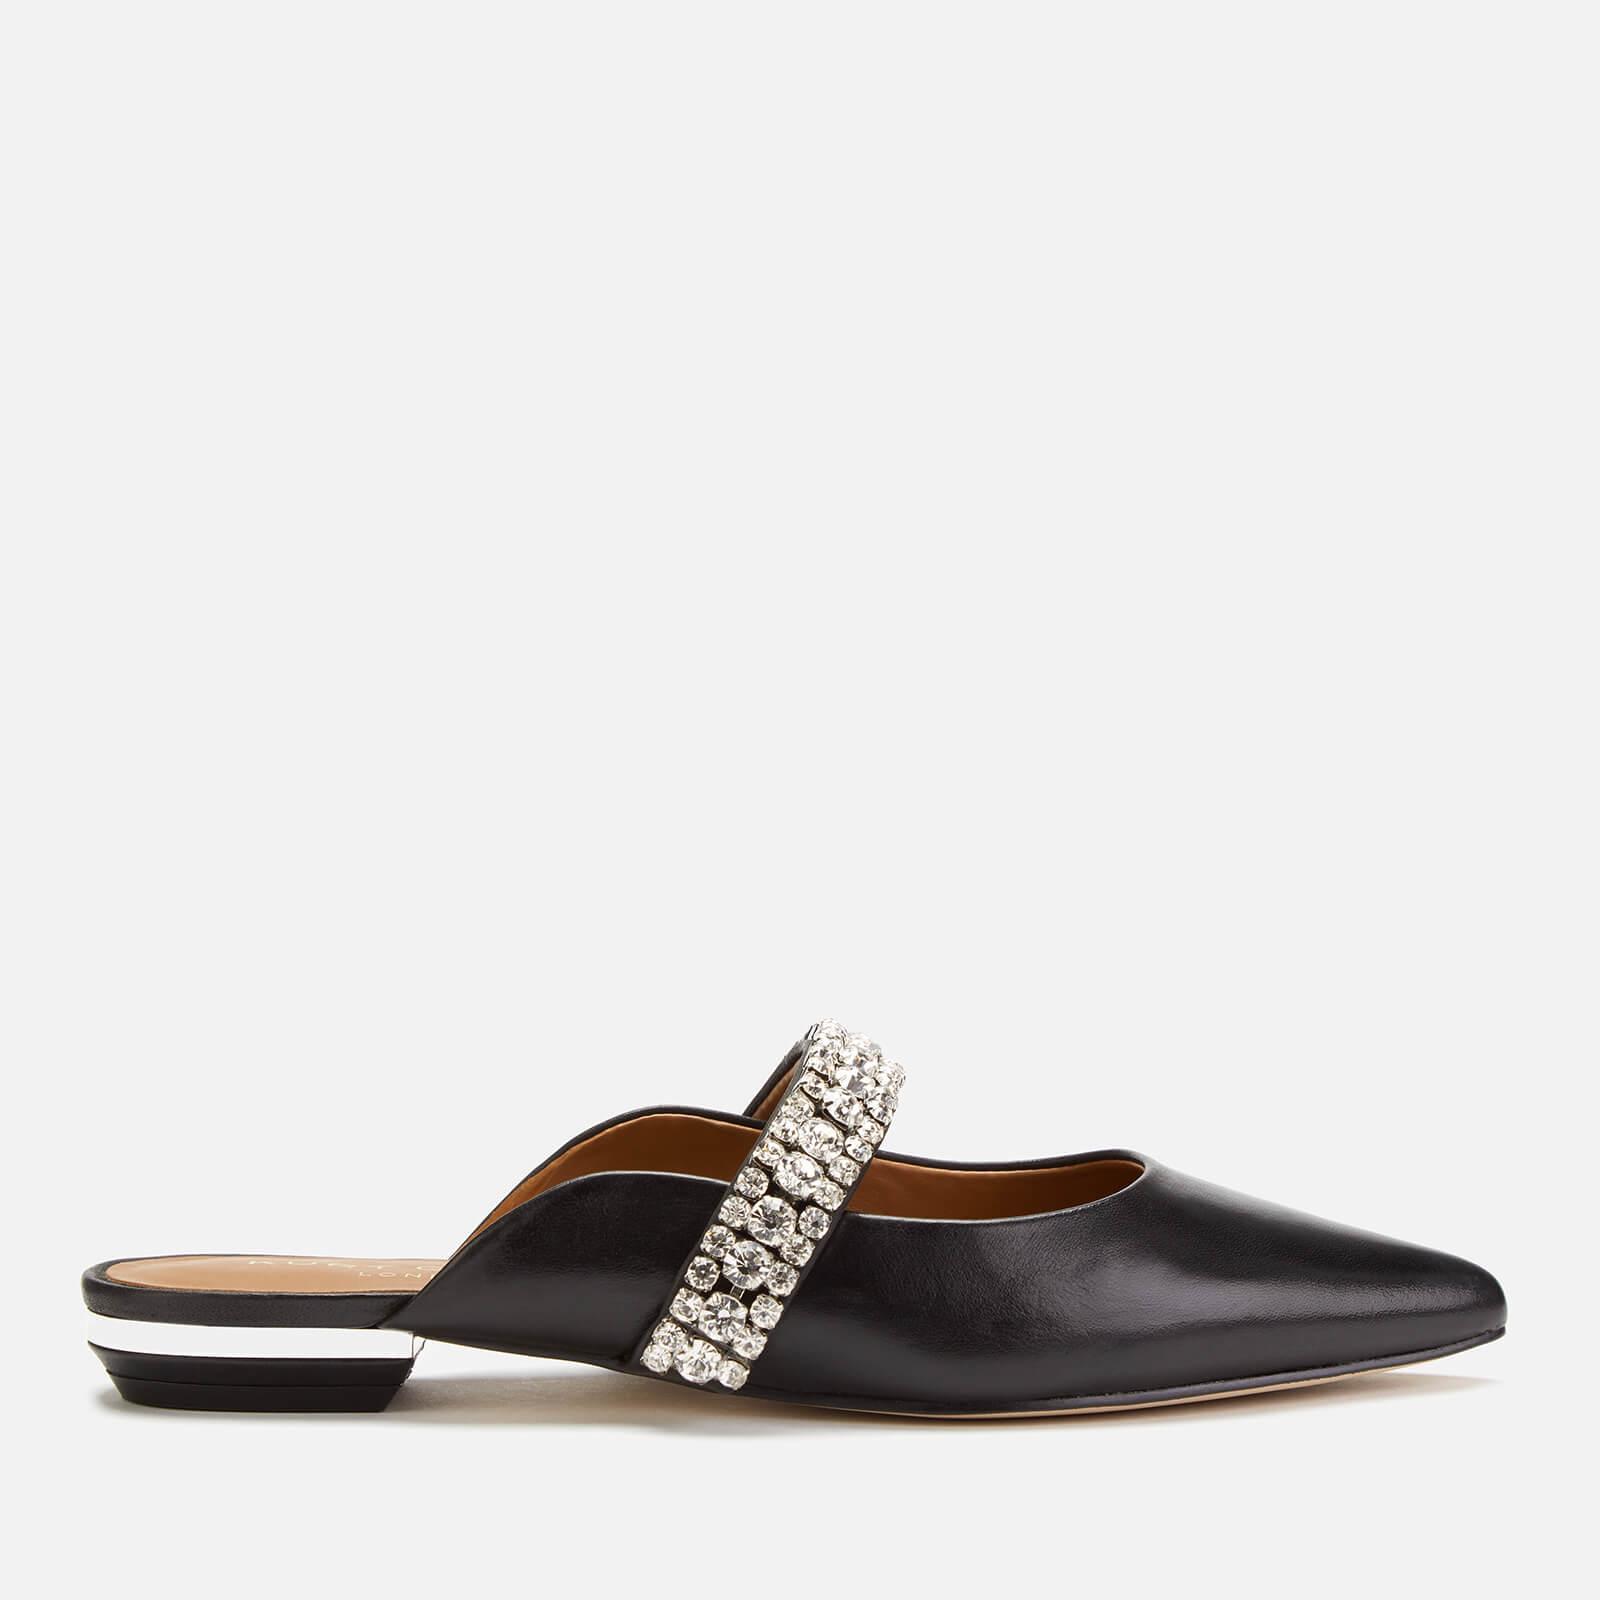 Kurt Geiger London Women's Princely Leather Flat Mules - Black - UK 3 - Black